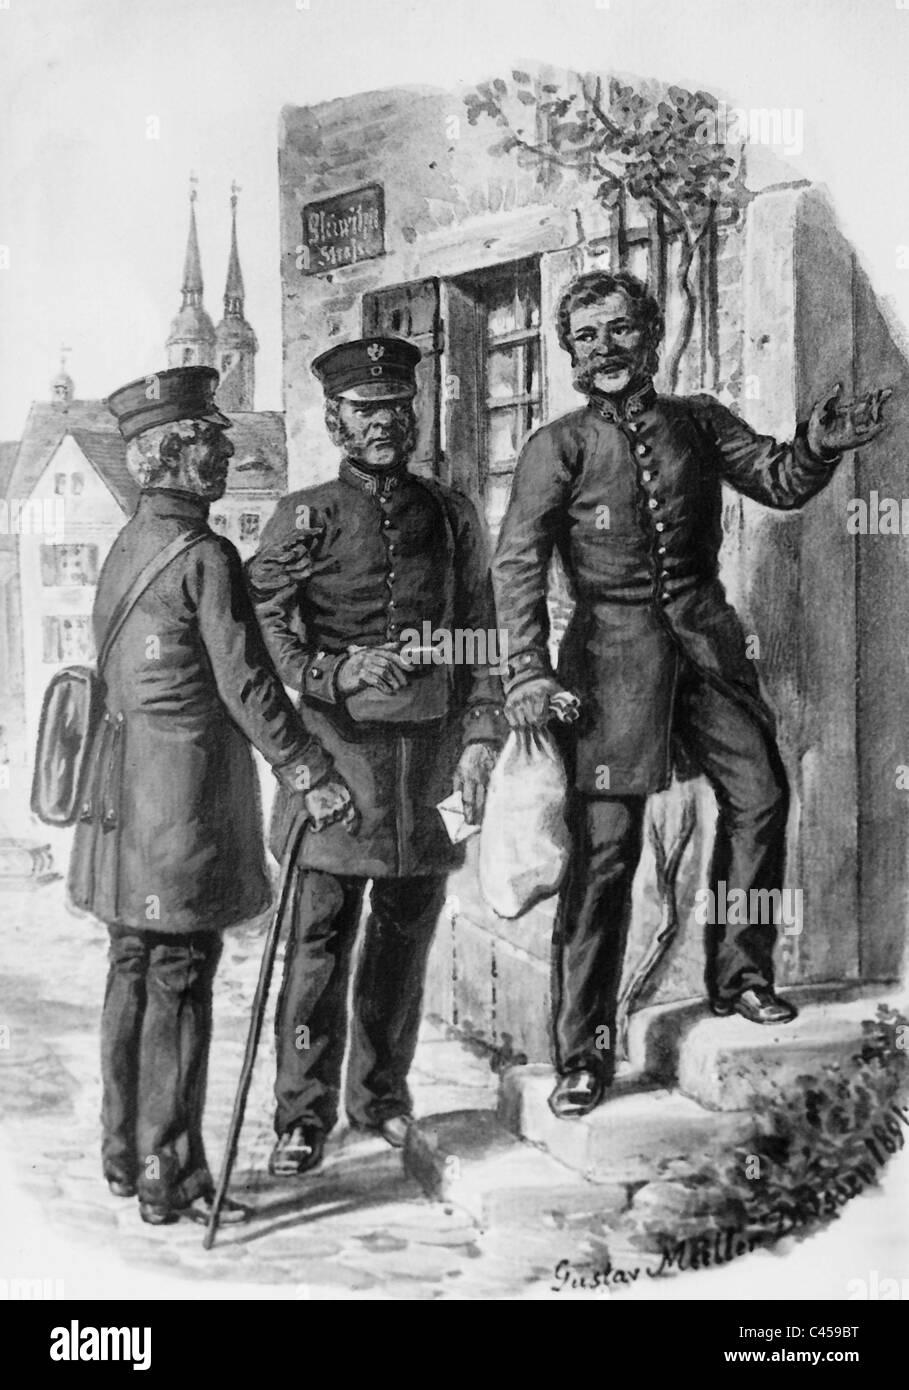 Mailmen in the 19th century. - Stock Image